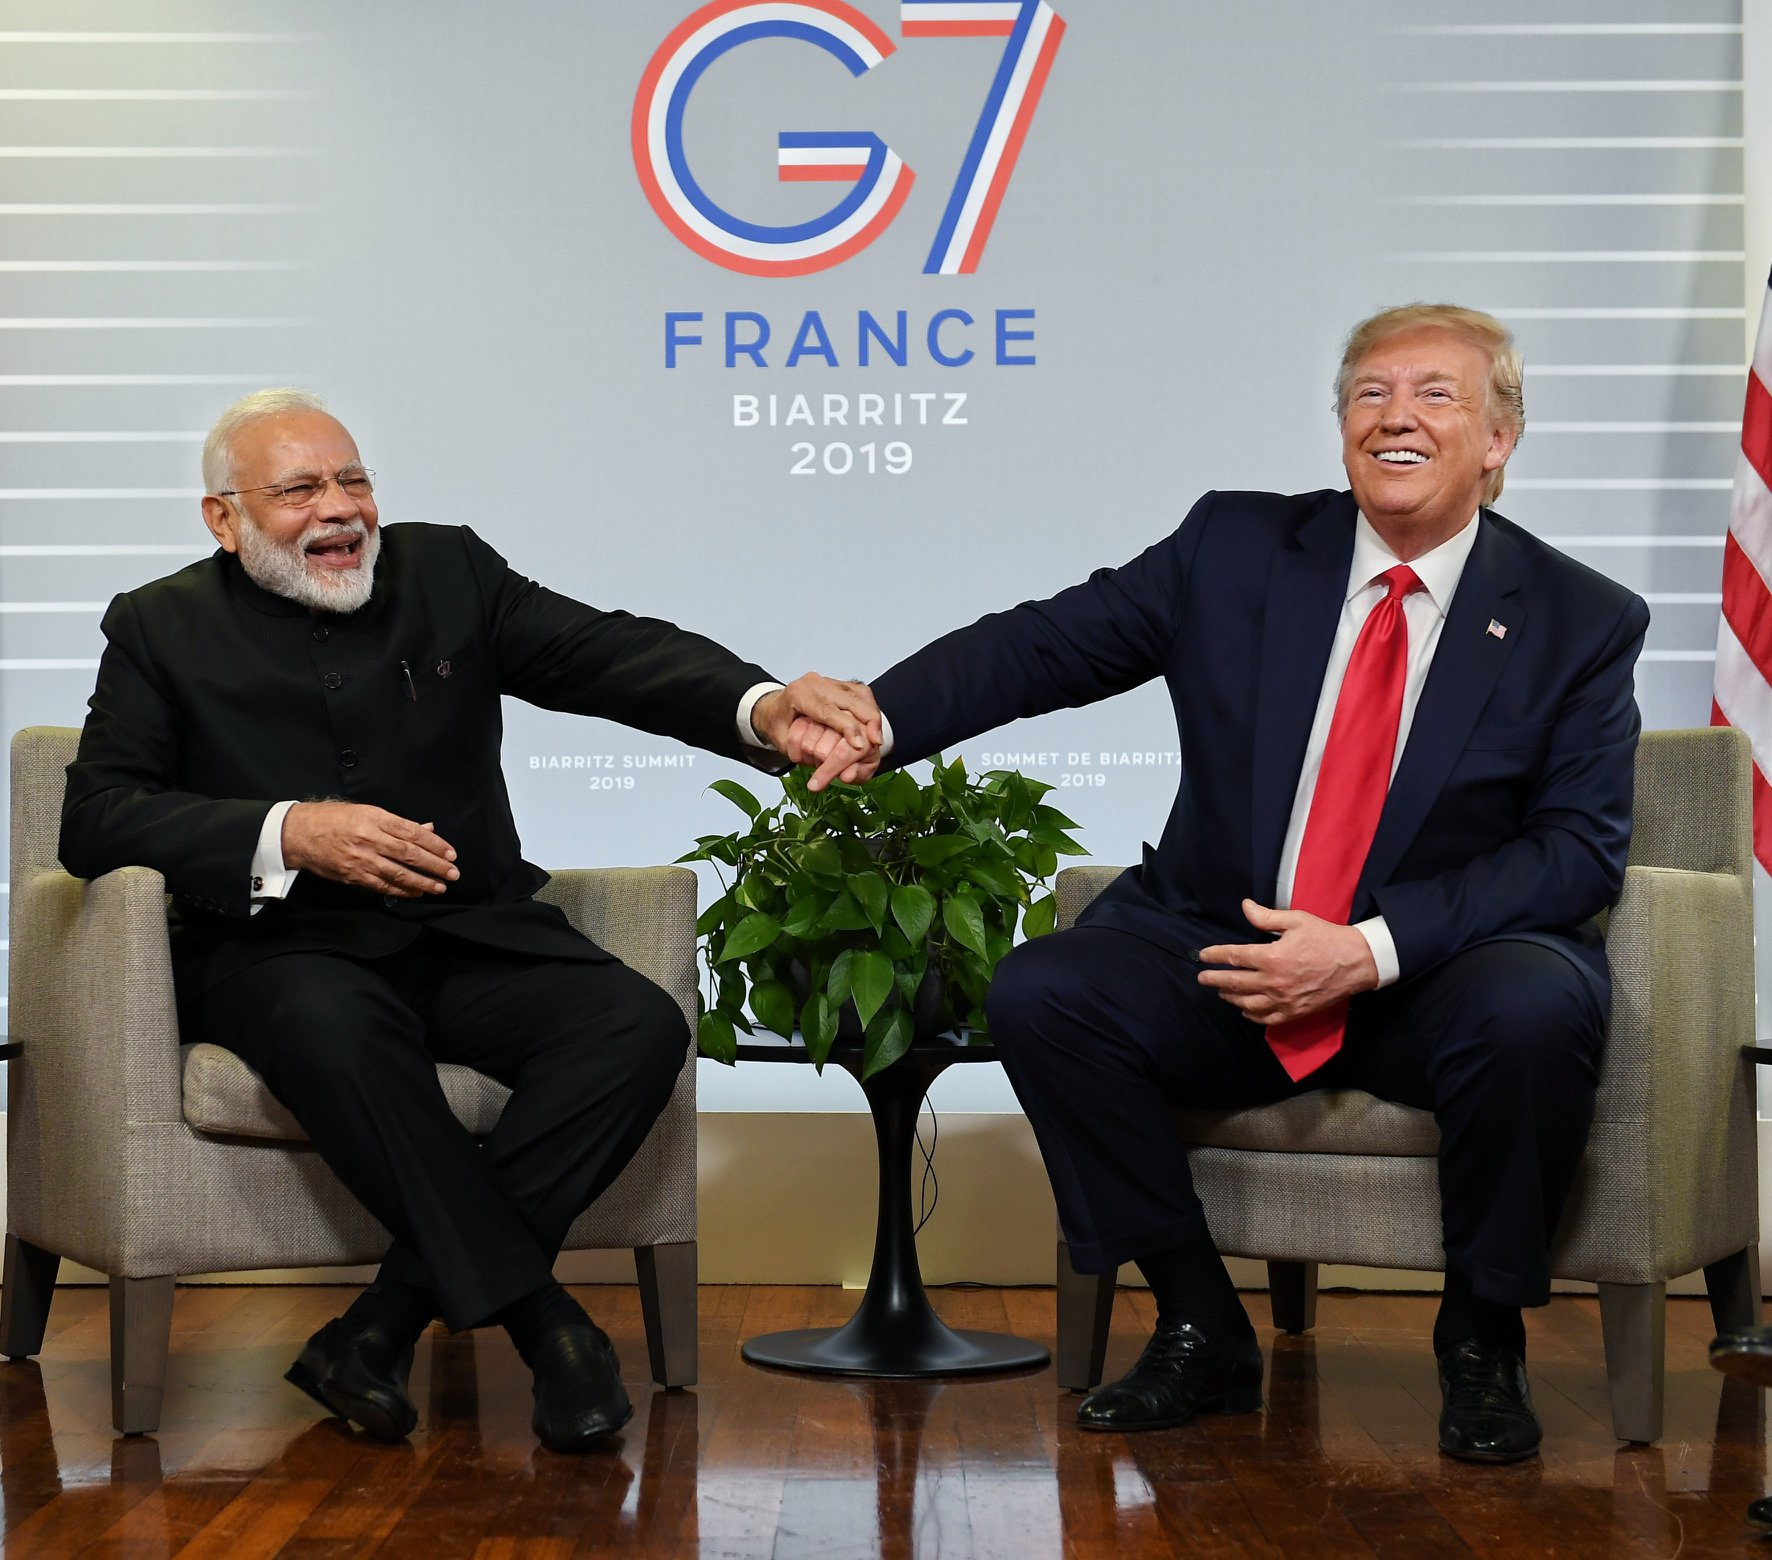 Trump Modi G7 France